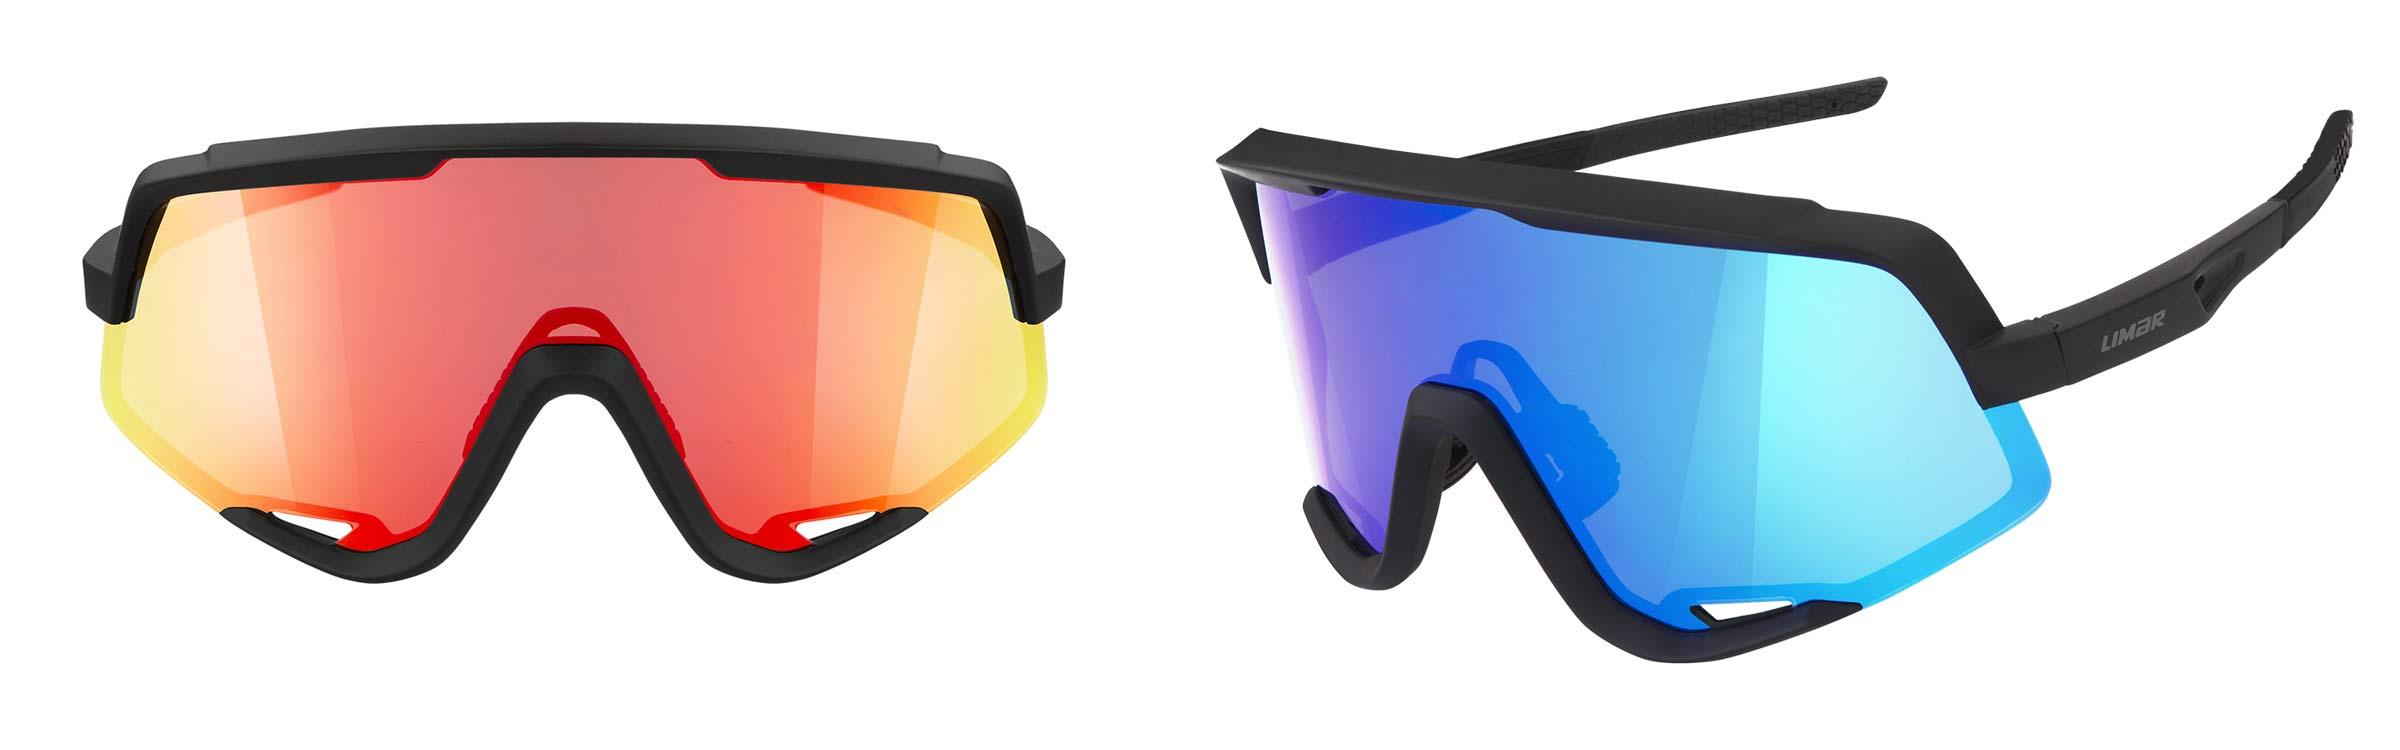 Limar Caos sunglasses matte black red or blue lens